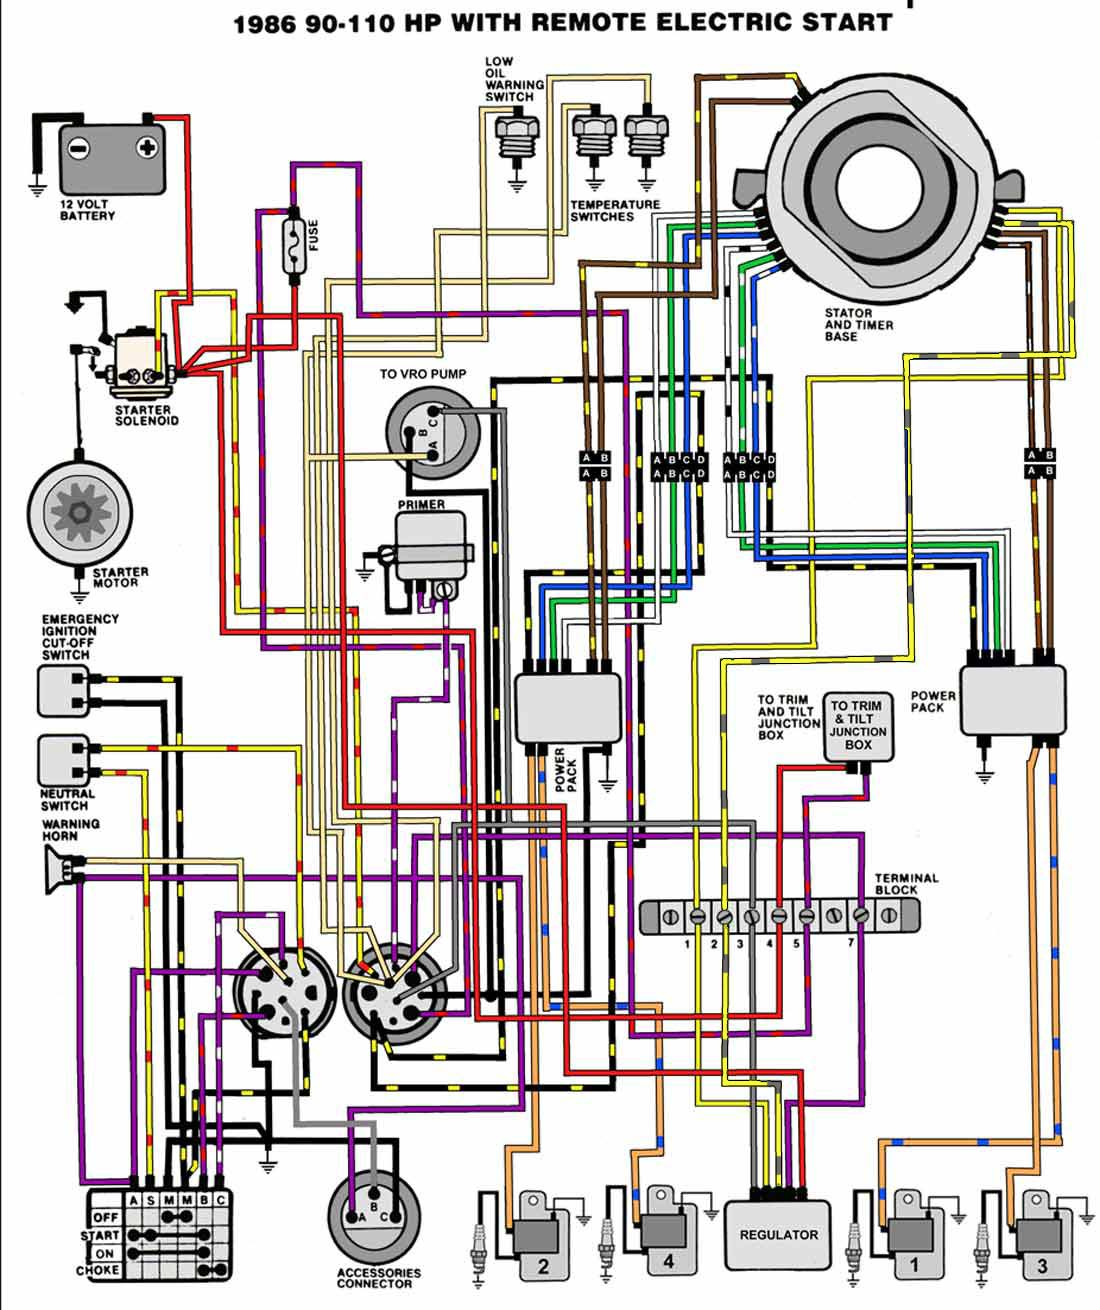 Force 40 Hp Mercury Tachometer Wiring Diagram List Of Schematic Mercedes Benz 1985 300sd 120 Evinrude Detailed Schematics Rh Jvpacks Com